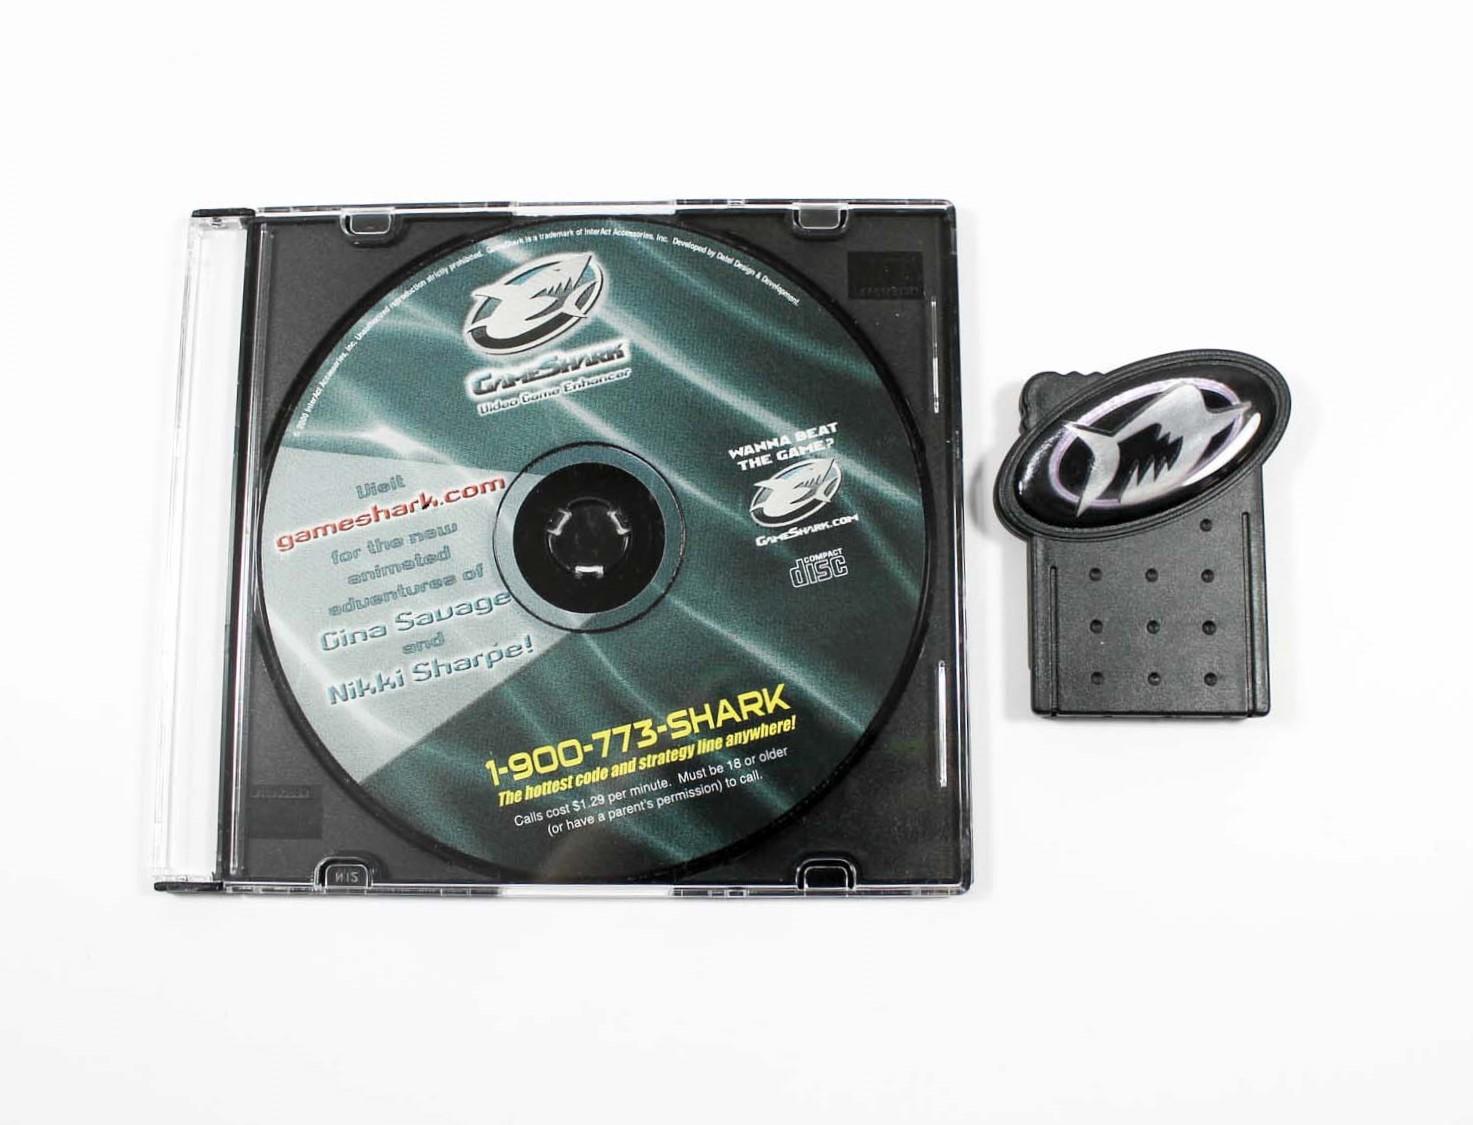 Playstation 1 PS1 Gameshark CDX